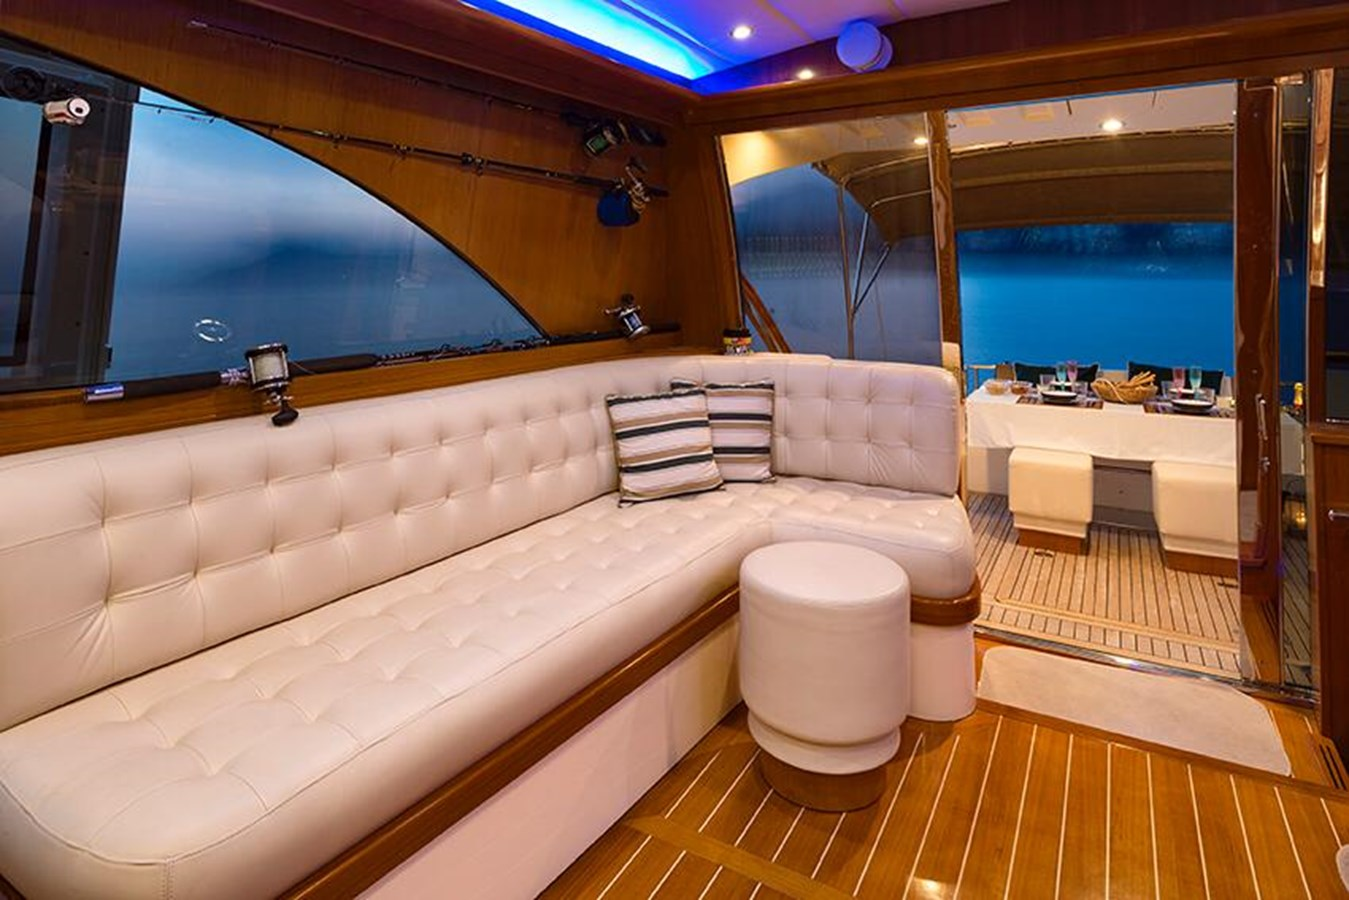 IMG-20200304-WA0016 2011 ABATI YACHTS kEYPORT 60 Motor Yacht 2879776